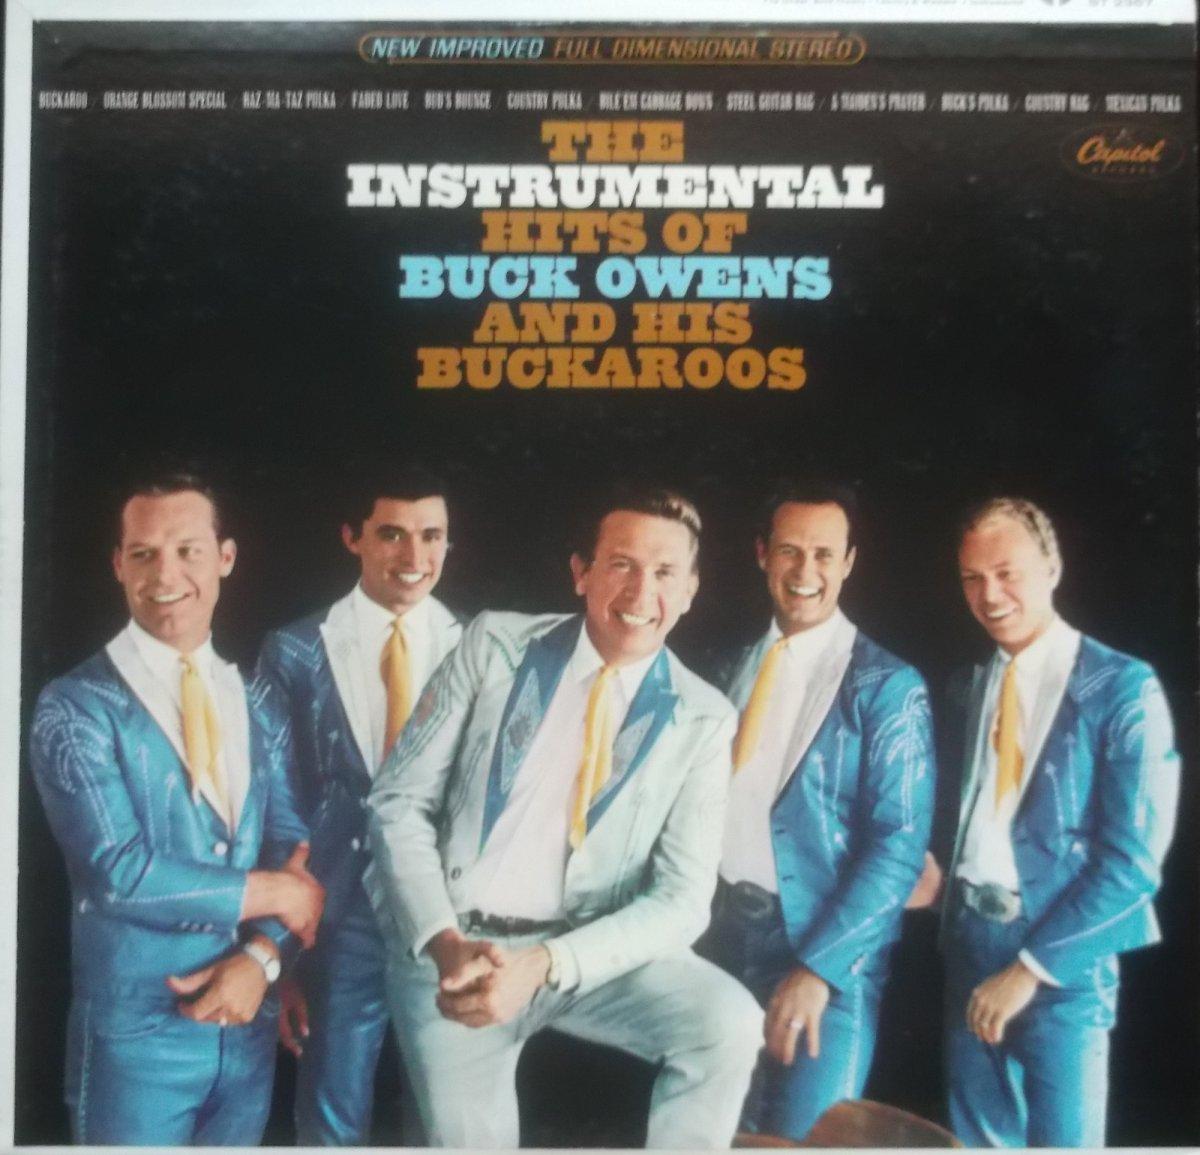 Buck Owens And His Buckaroos – The Instrumental Hits Of Buck Owens And His Buckaroos